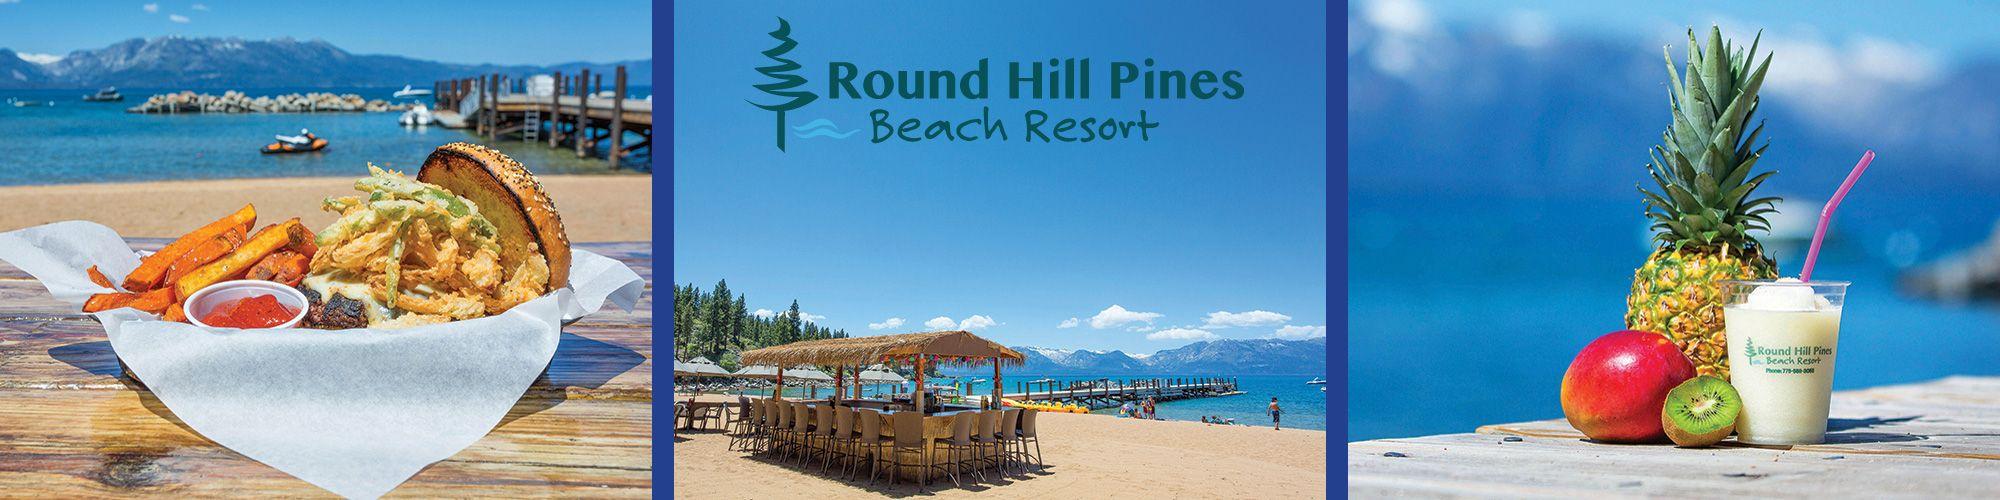 Round Hill Pines Beach Resort